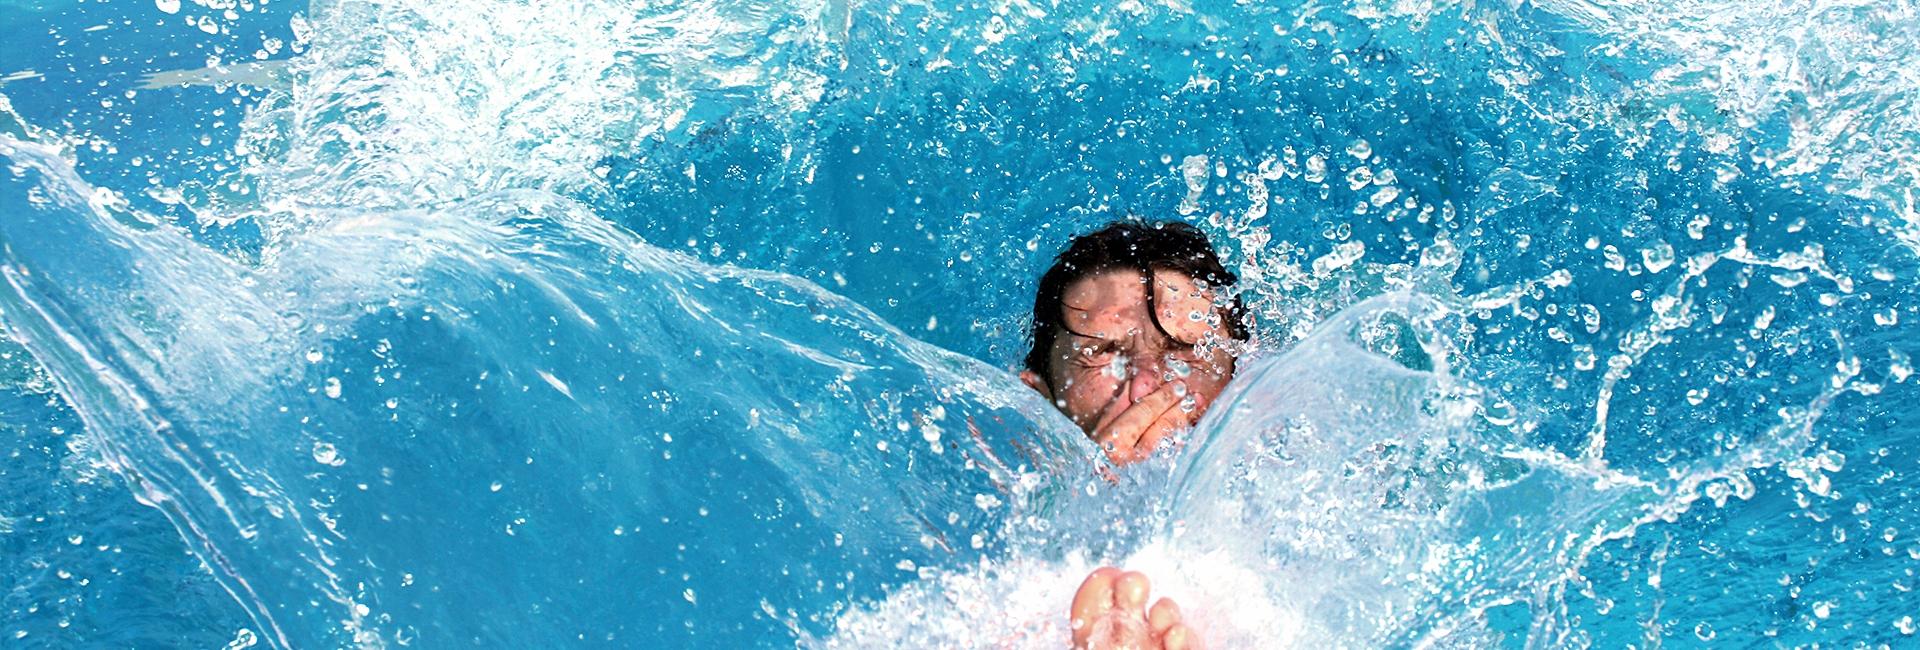 Poseidon entretien piscine spa montr al rive sud for Service entretien piscine